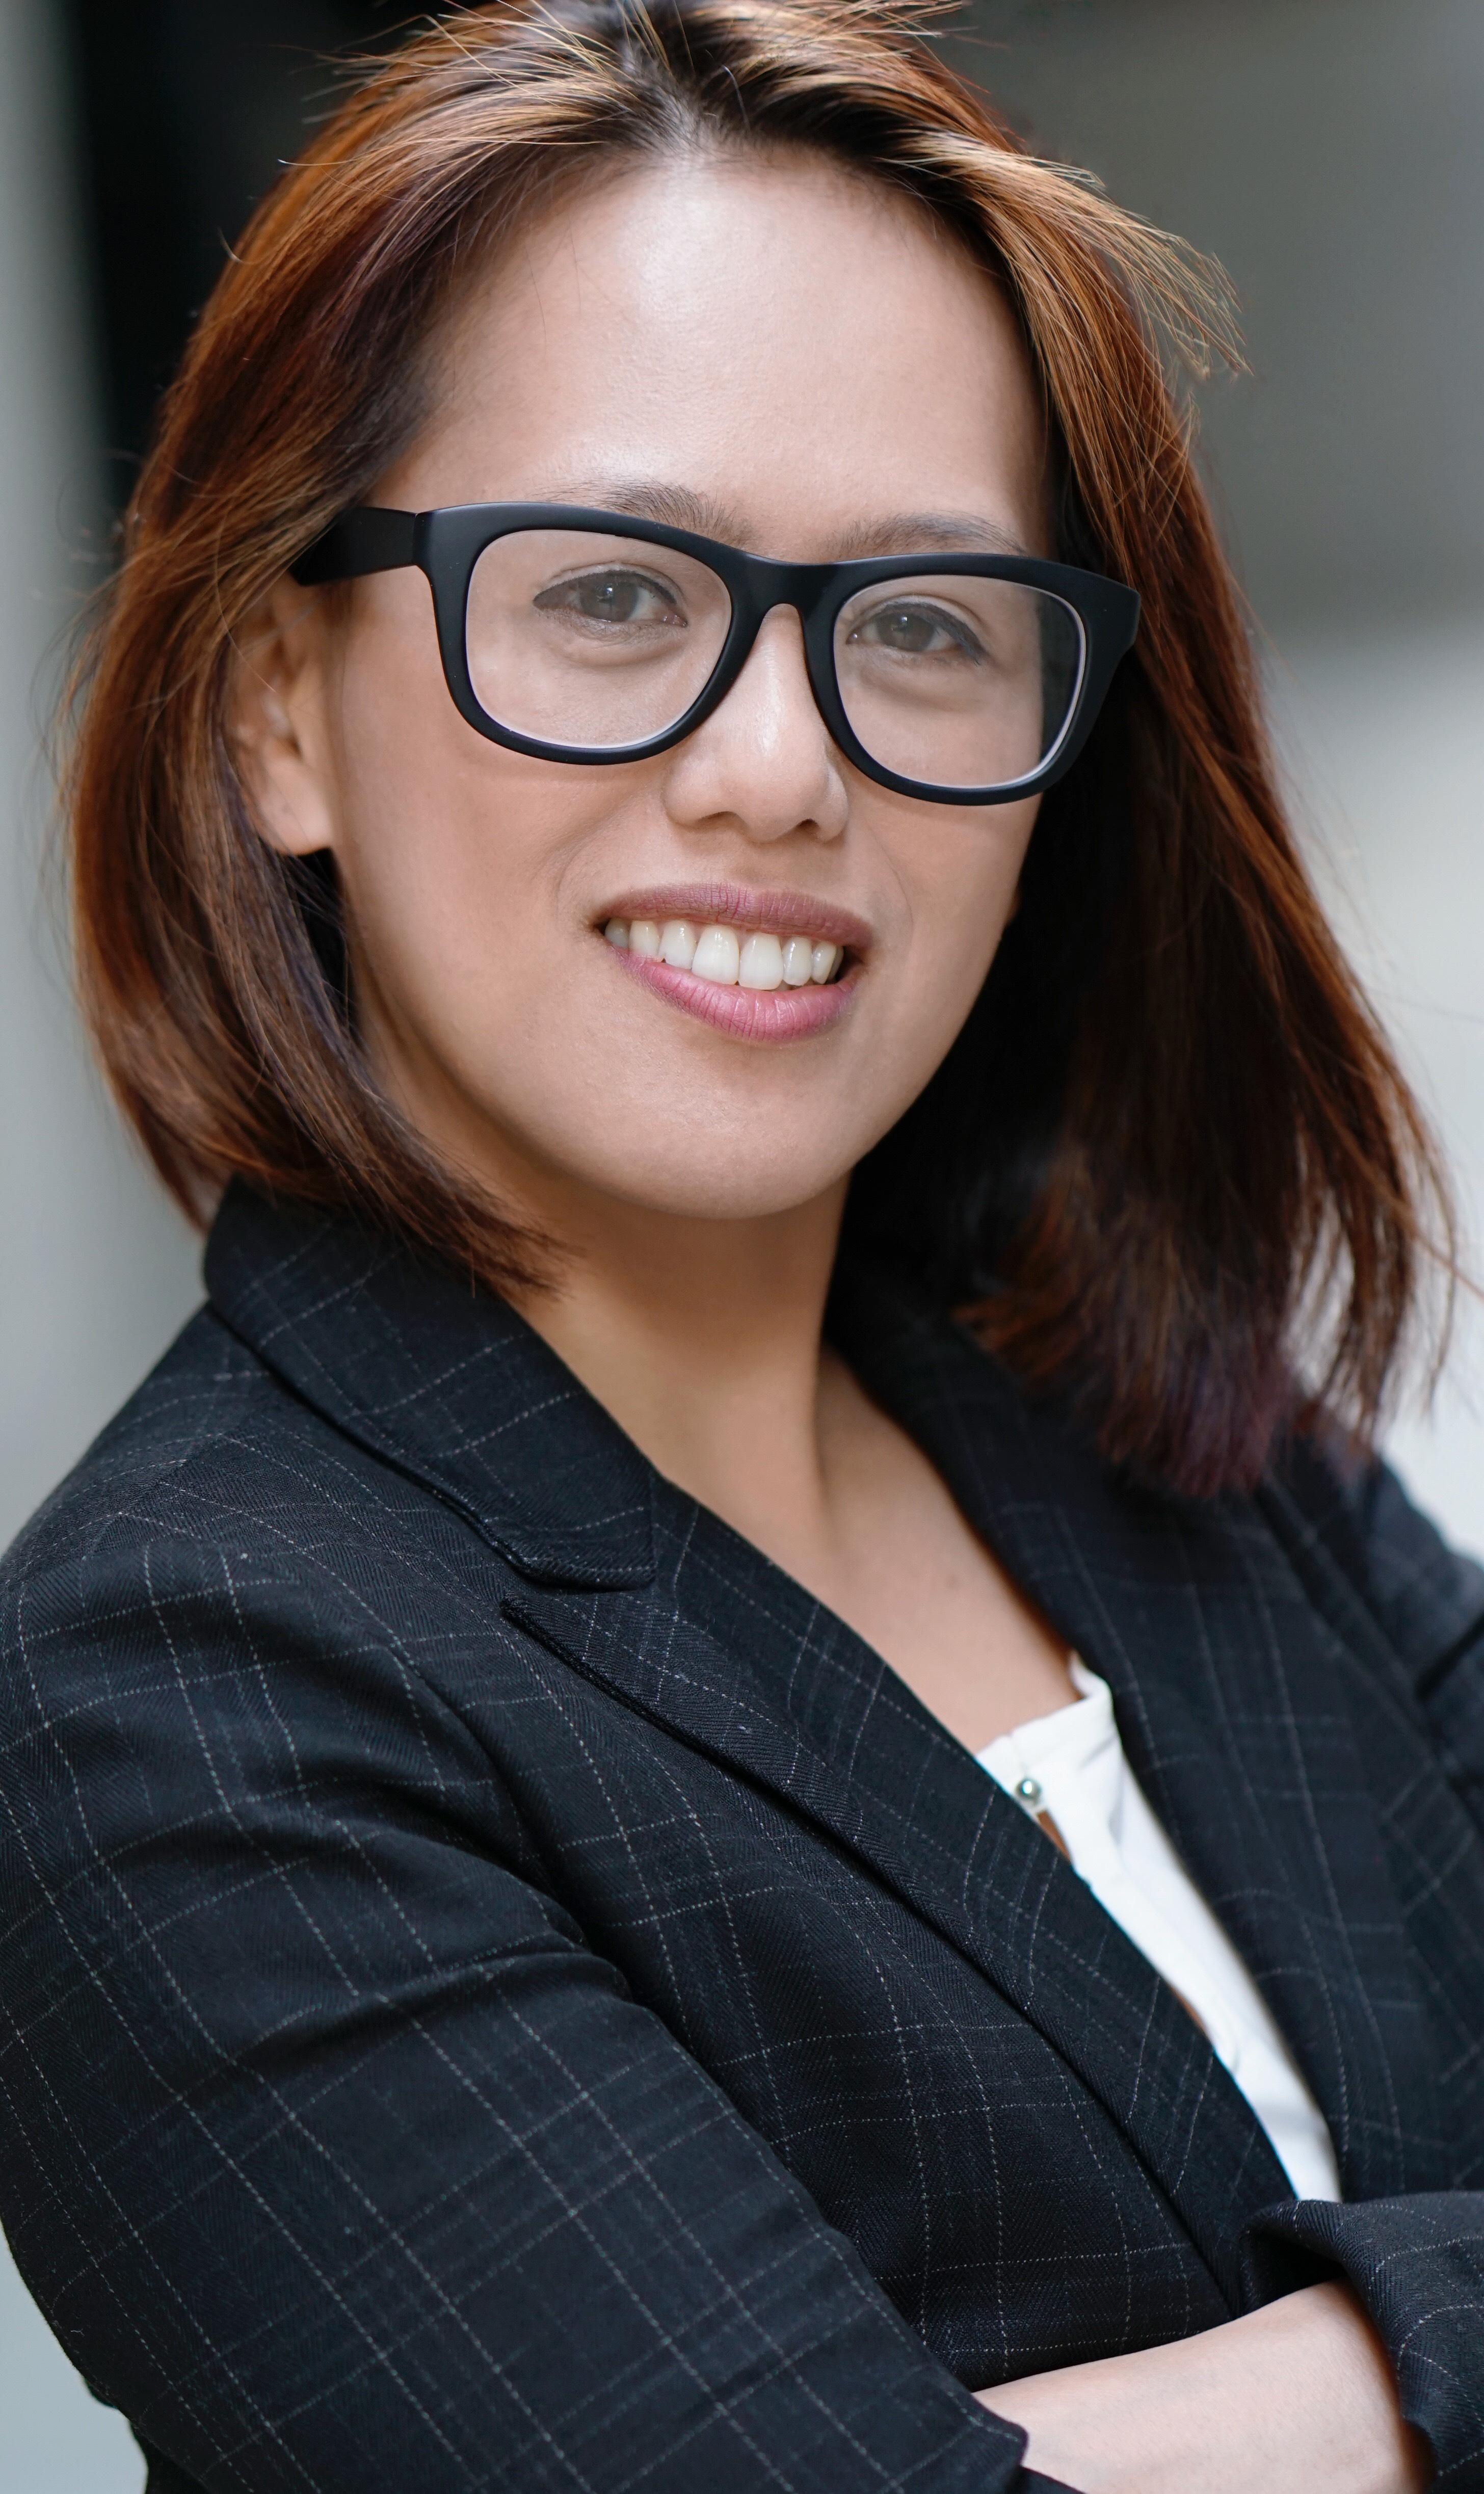 Joyce Lao eyeglass headshot